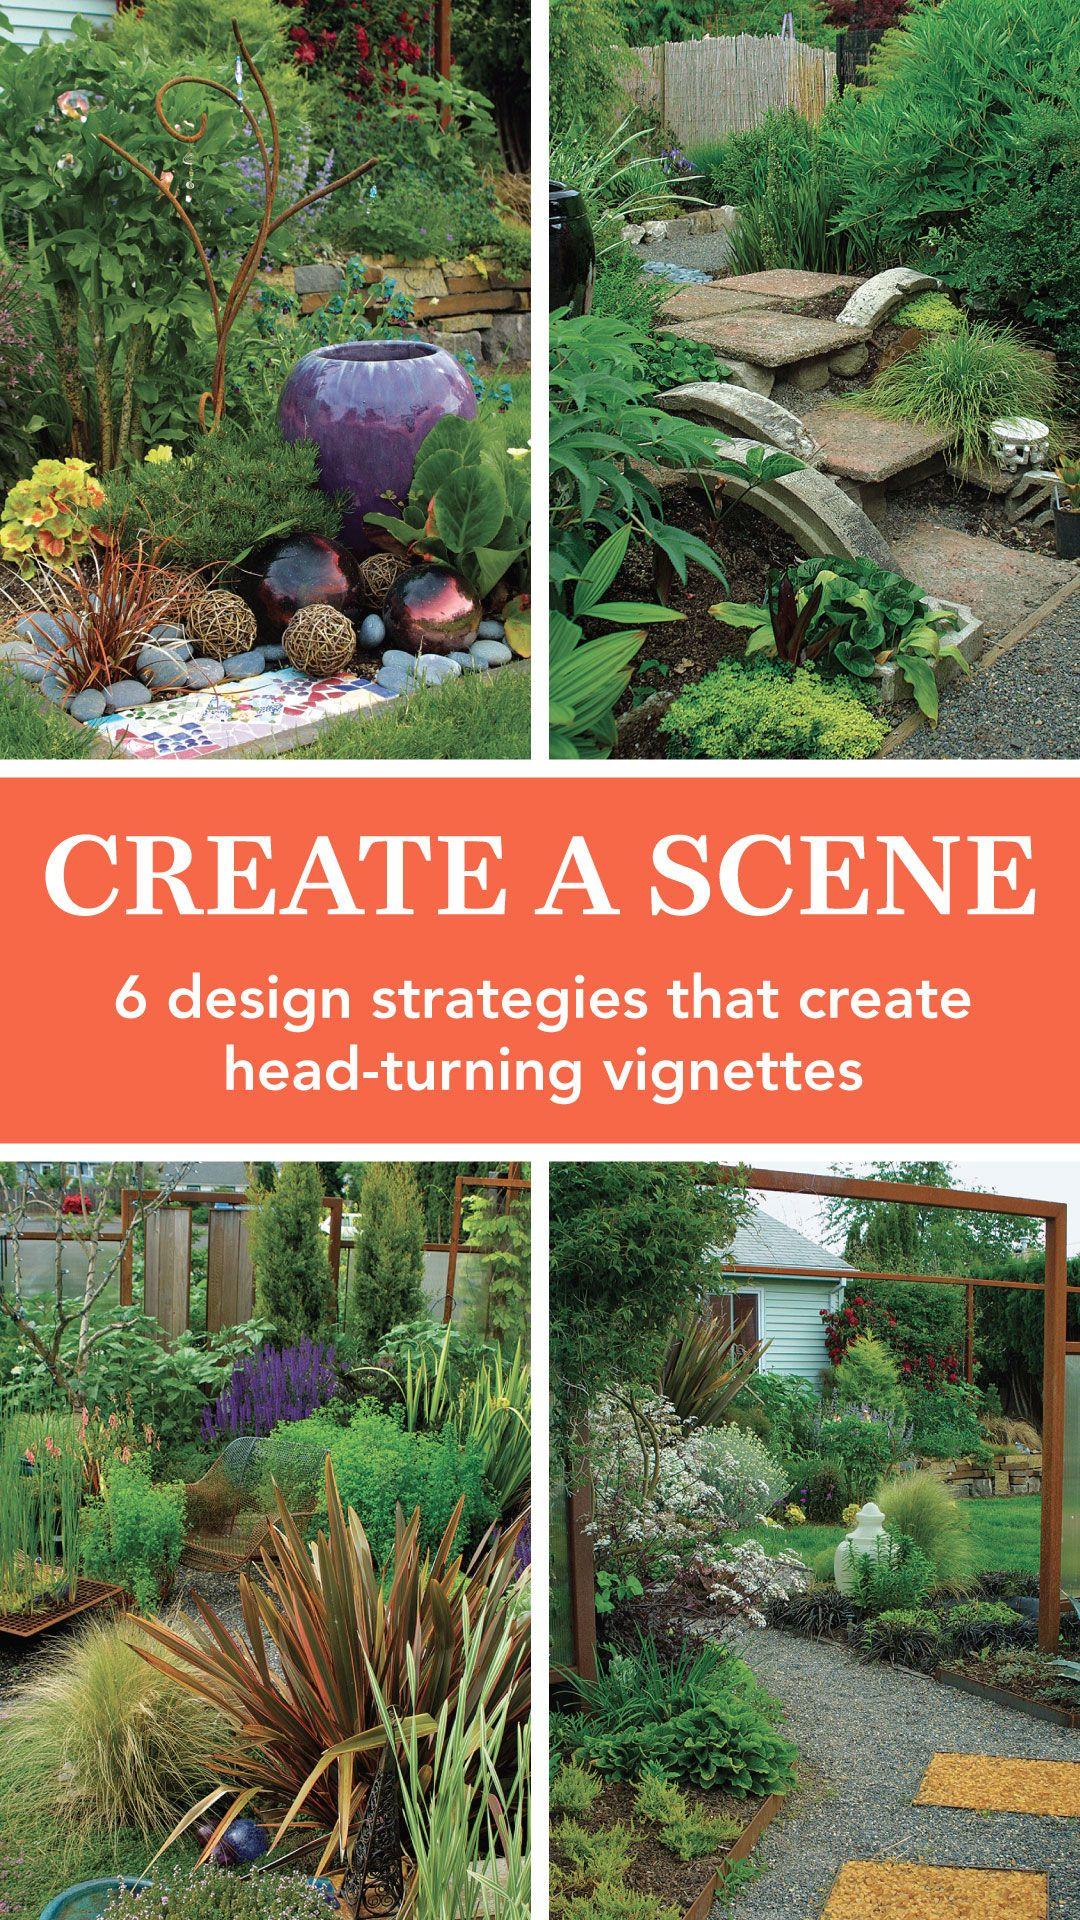 Creating A Scene Finegardening Garden Yard Ideas Garden Styles Backyard Landscaping